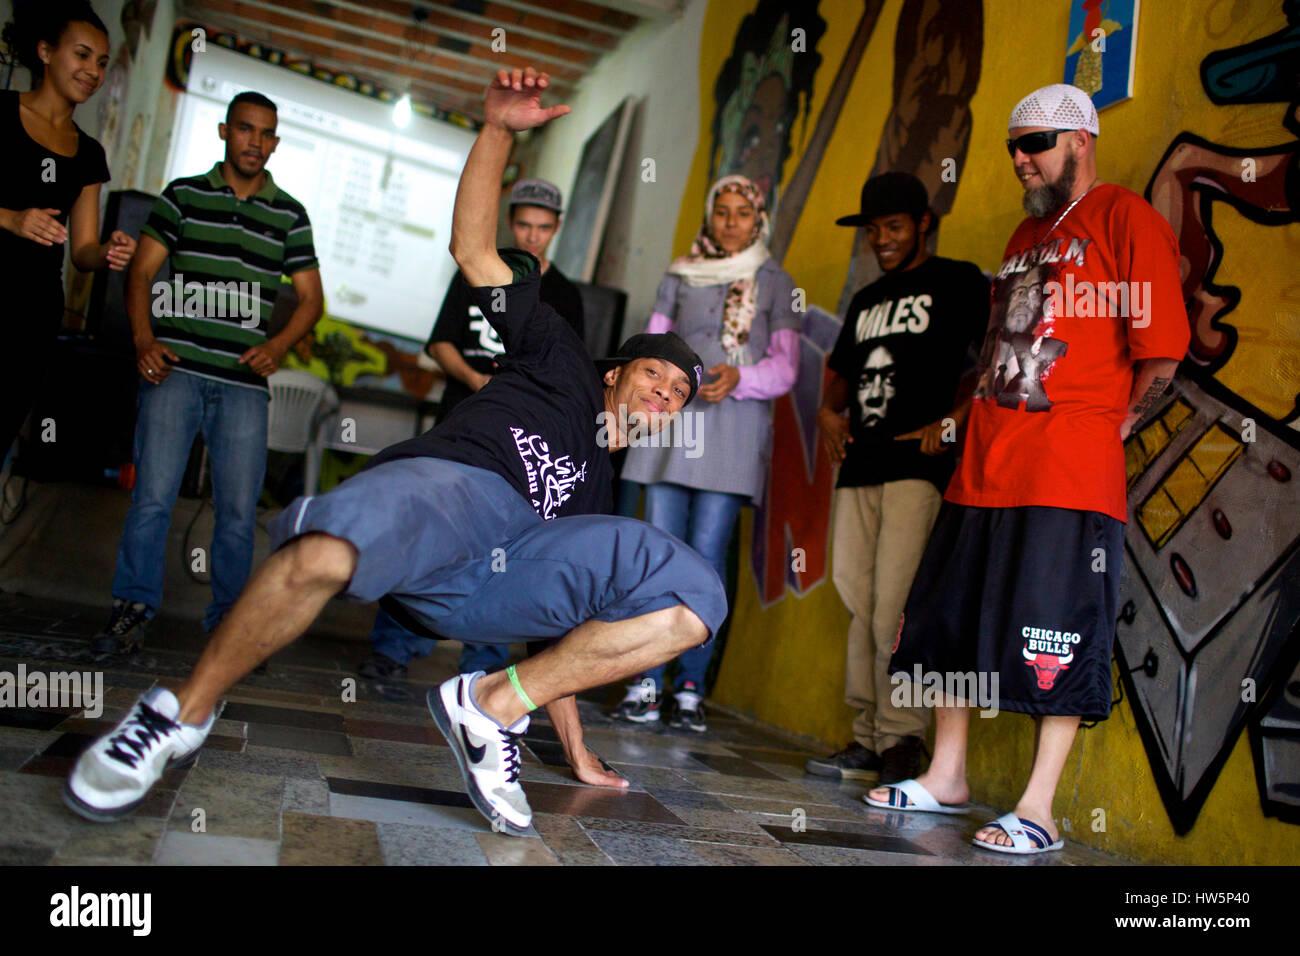 Hip Hop Jihad -  11/09/2013  -  Brazil / Sao Paulo  -  Kaab al Qadir, Elaine  and some graphers in islamic center Stock Photo